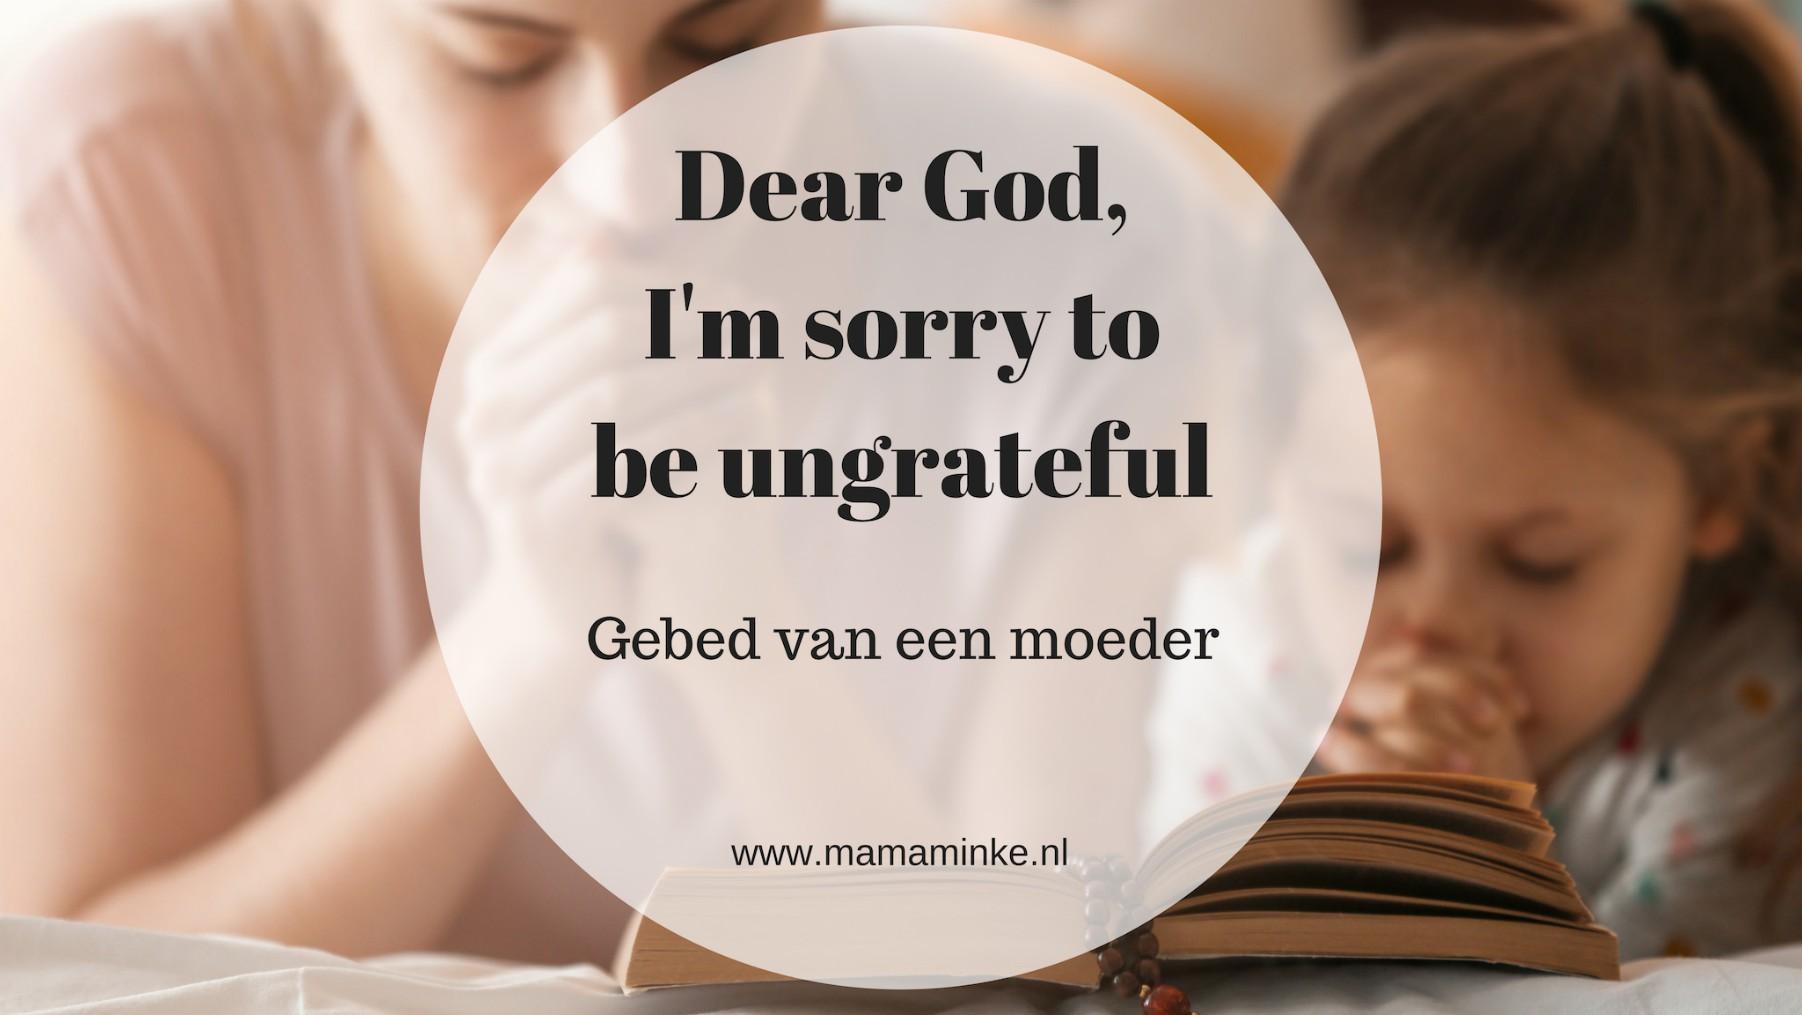 Dear God, I'm sorry to be ungratefull – gebed van een mama